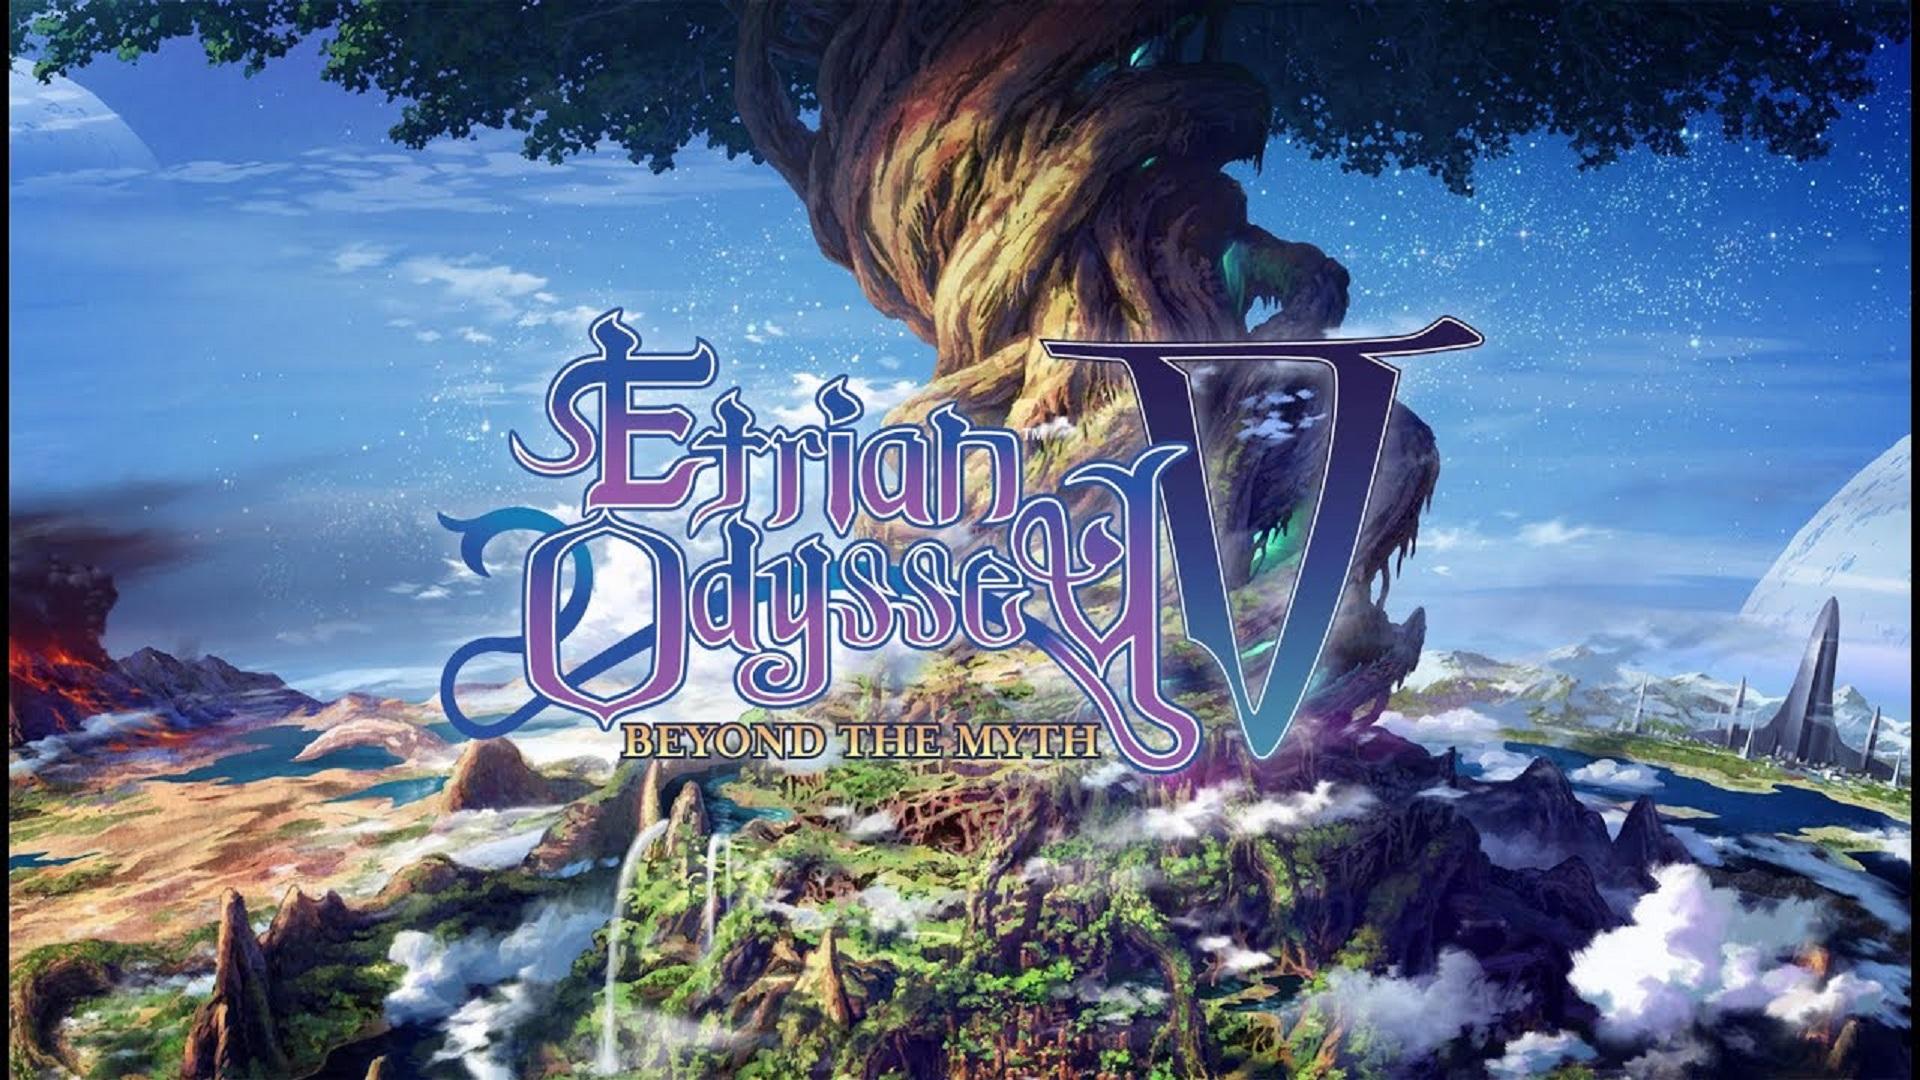 Etrian Odyssey V: Beyond the Myth tung trailer mới - Tin Game